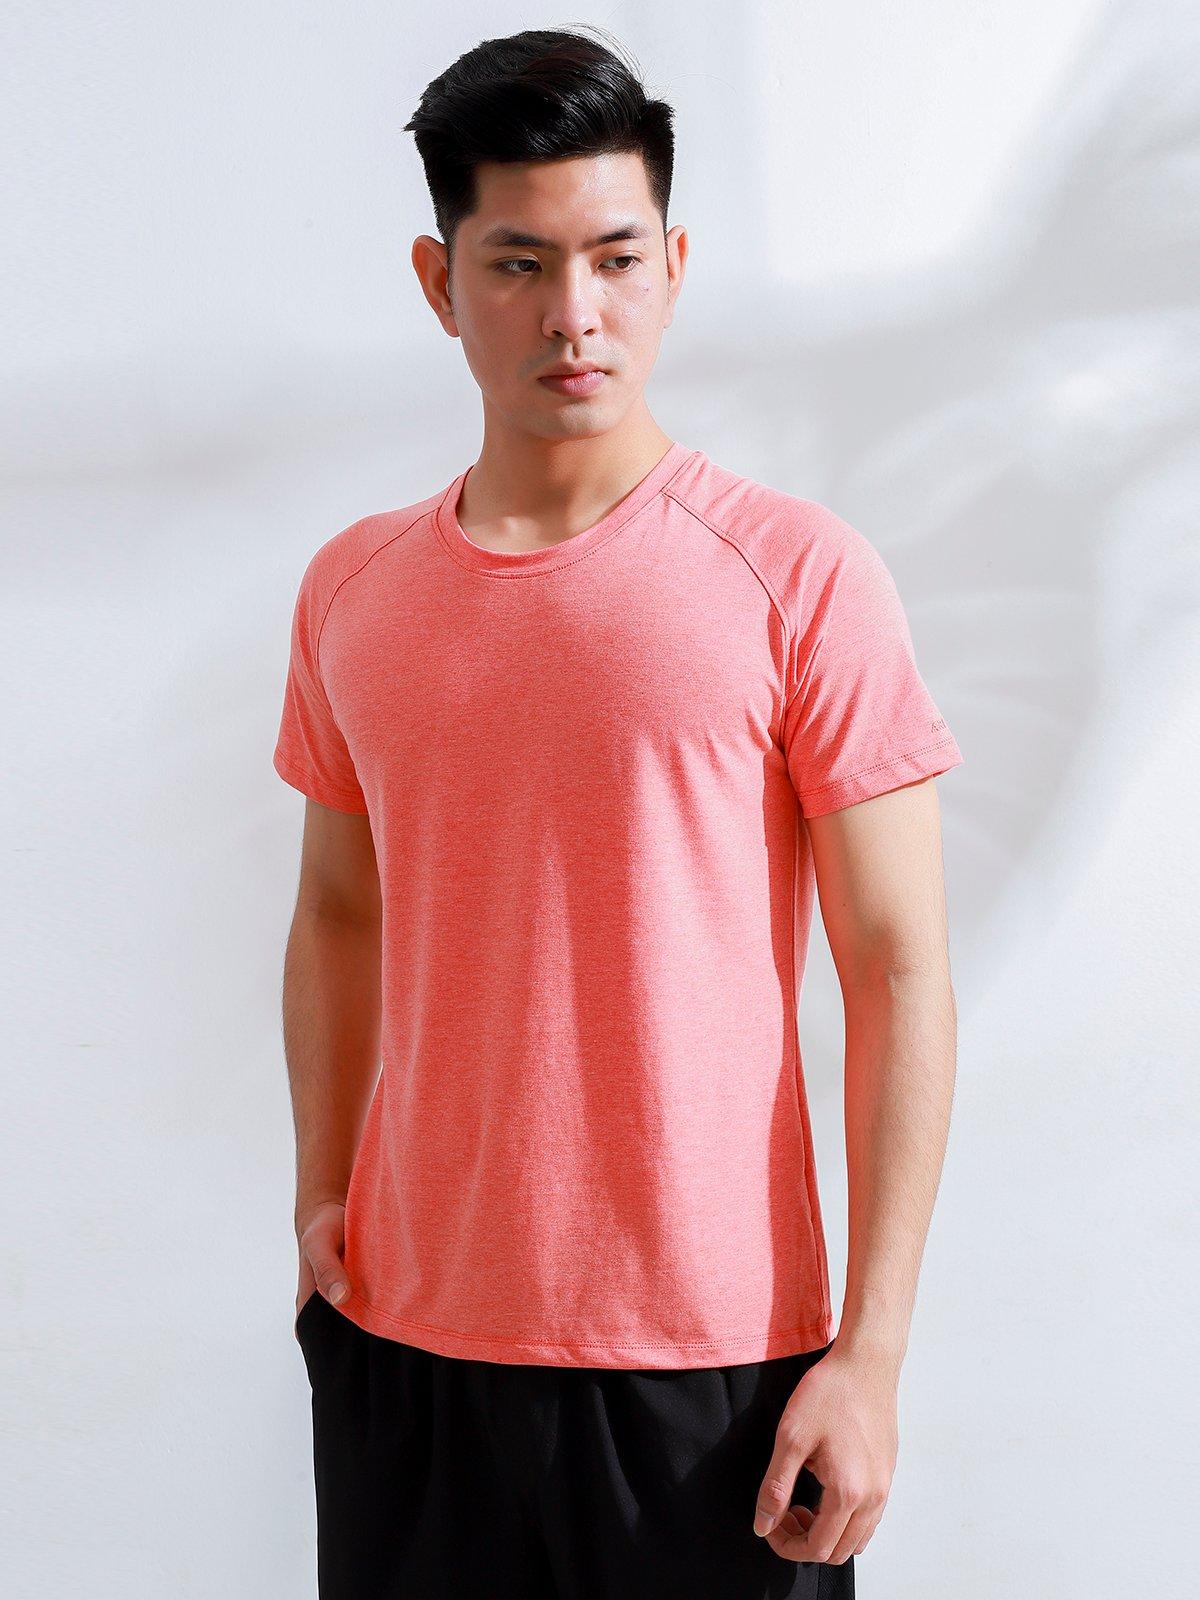 Áo T-shirt nam Aristino ATS031S8